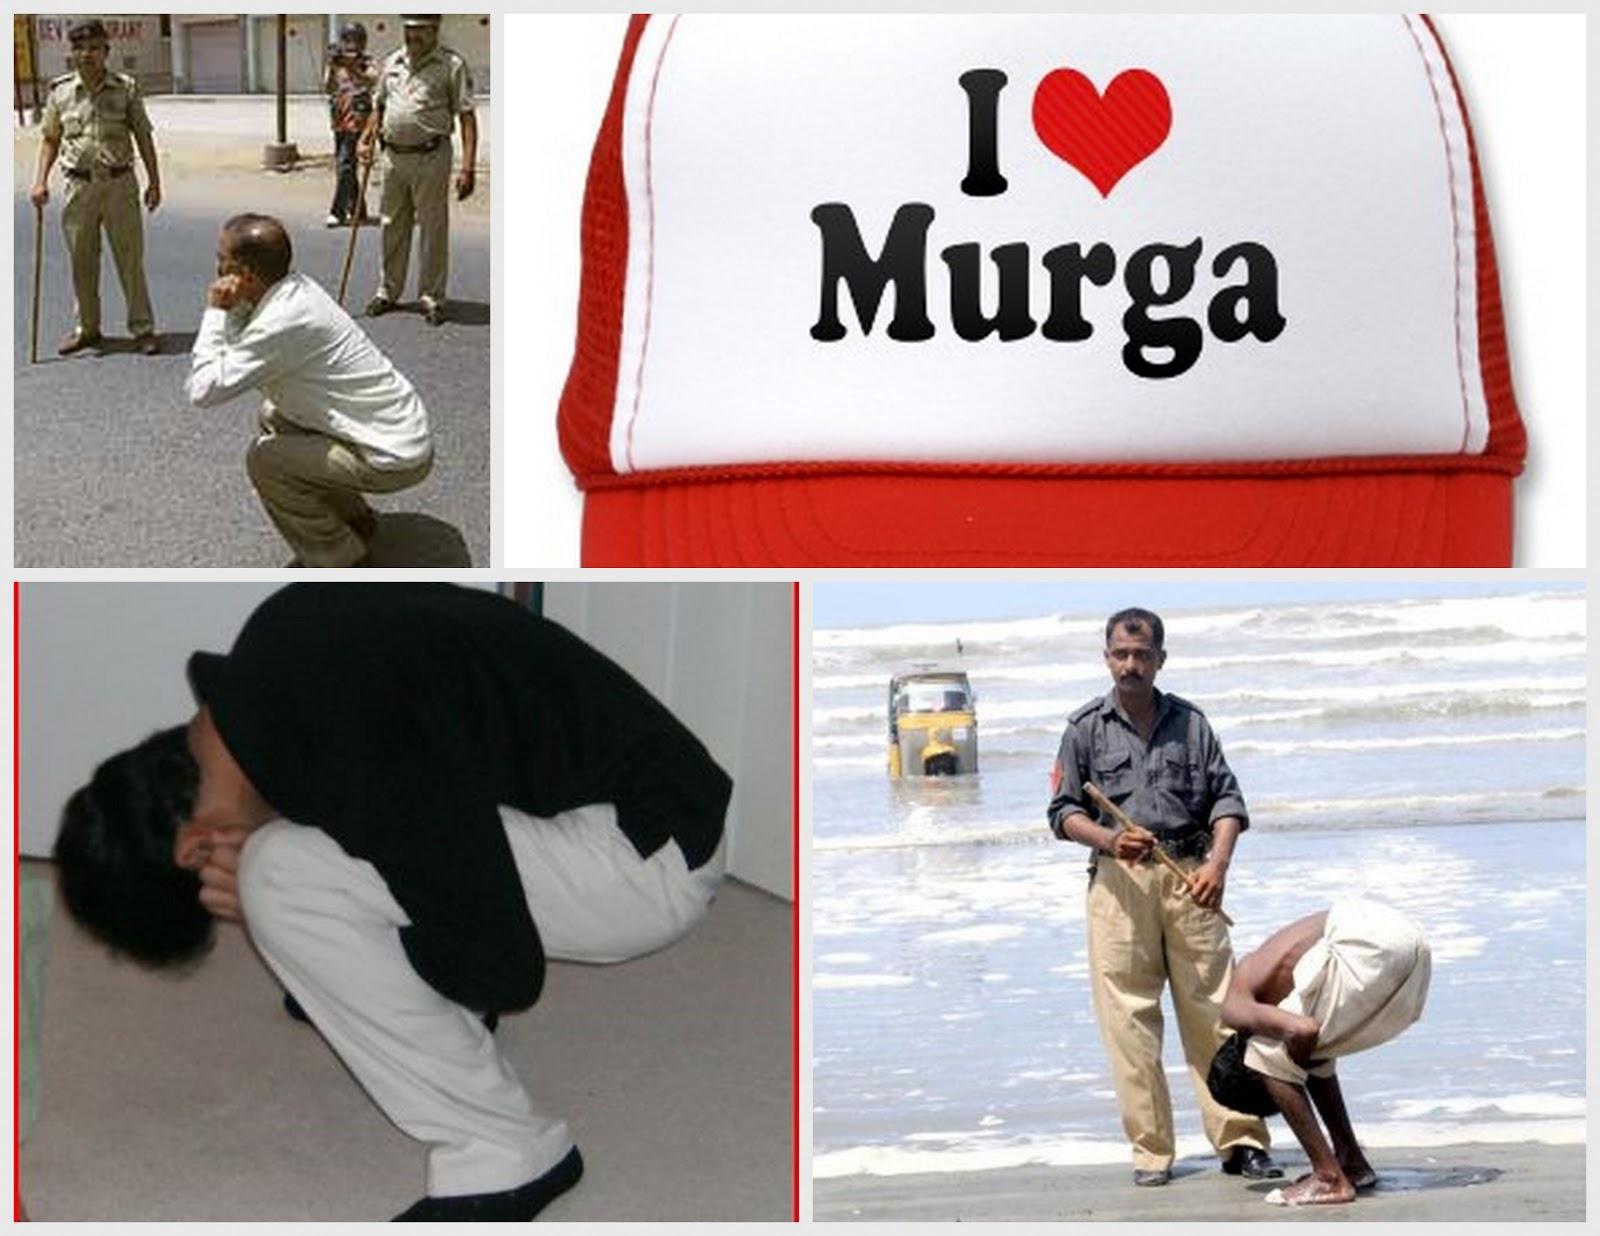 Murga Position